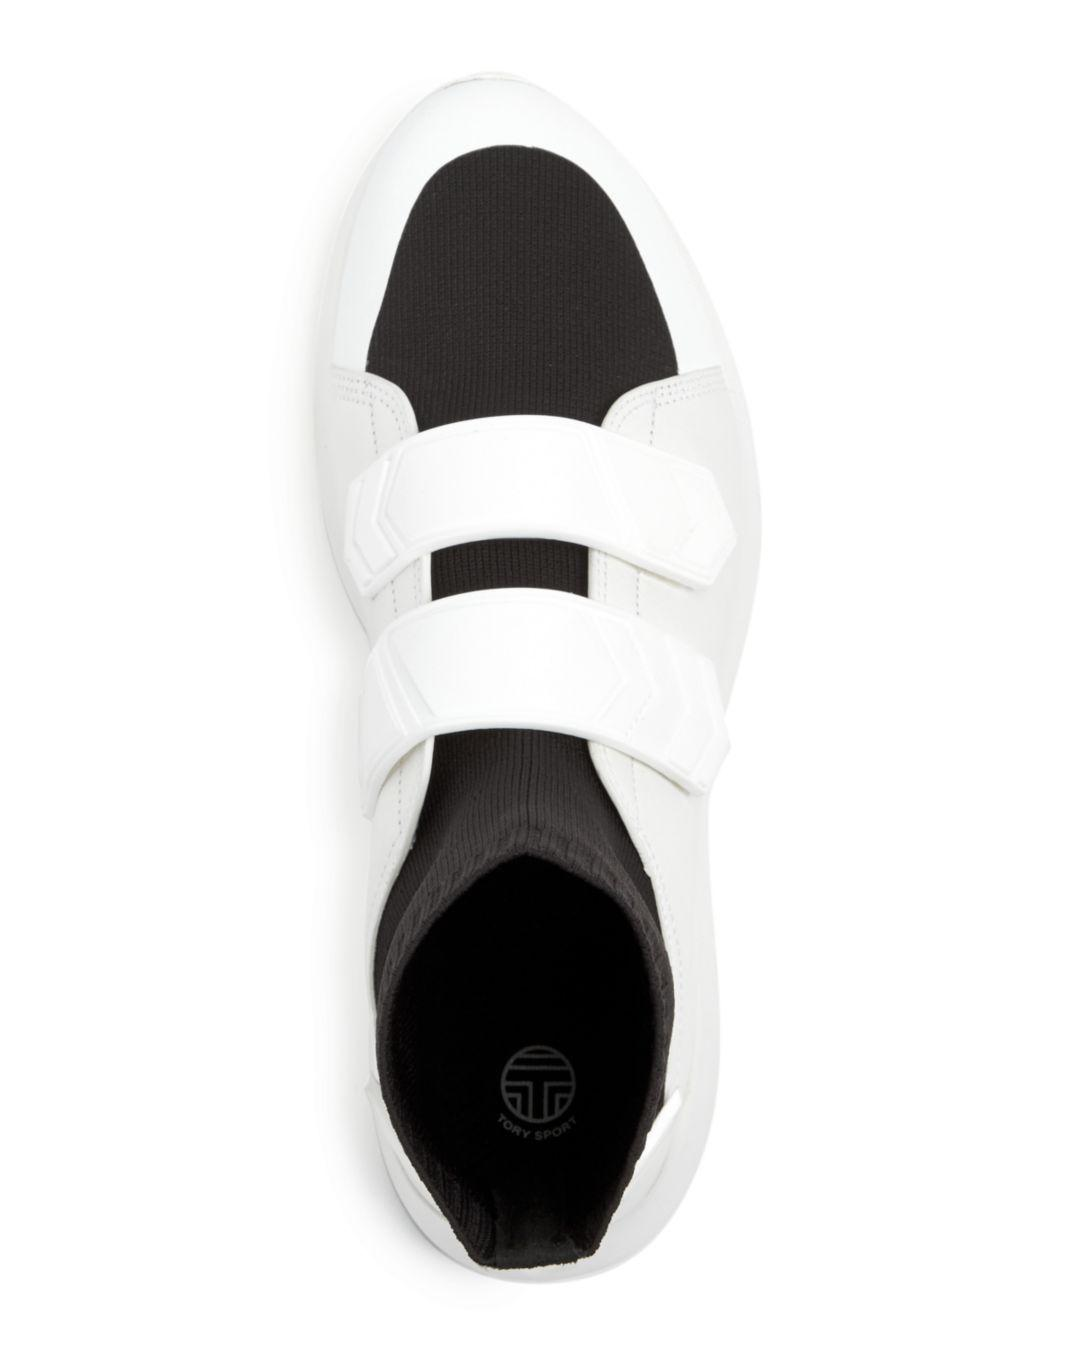 afcbe86e46de Tory Sport - Black Tory Burch Women s Chevron Leather   Knit High Top  Sneakers - Lyst. View fullscreen